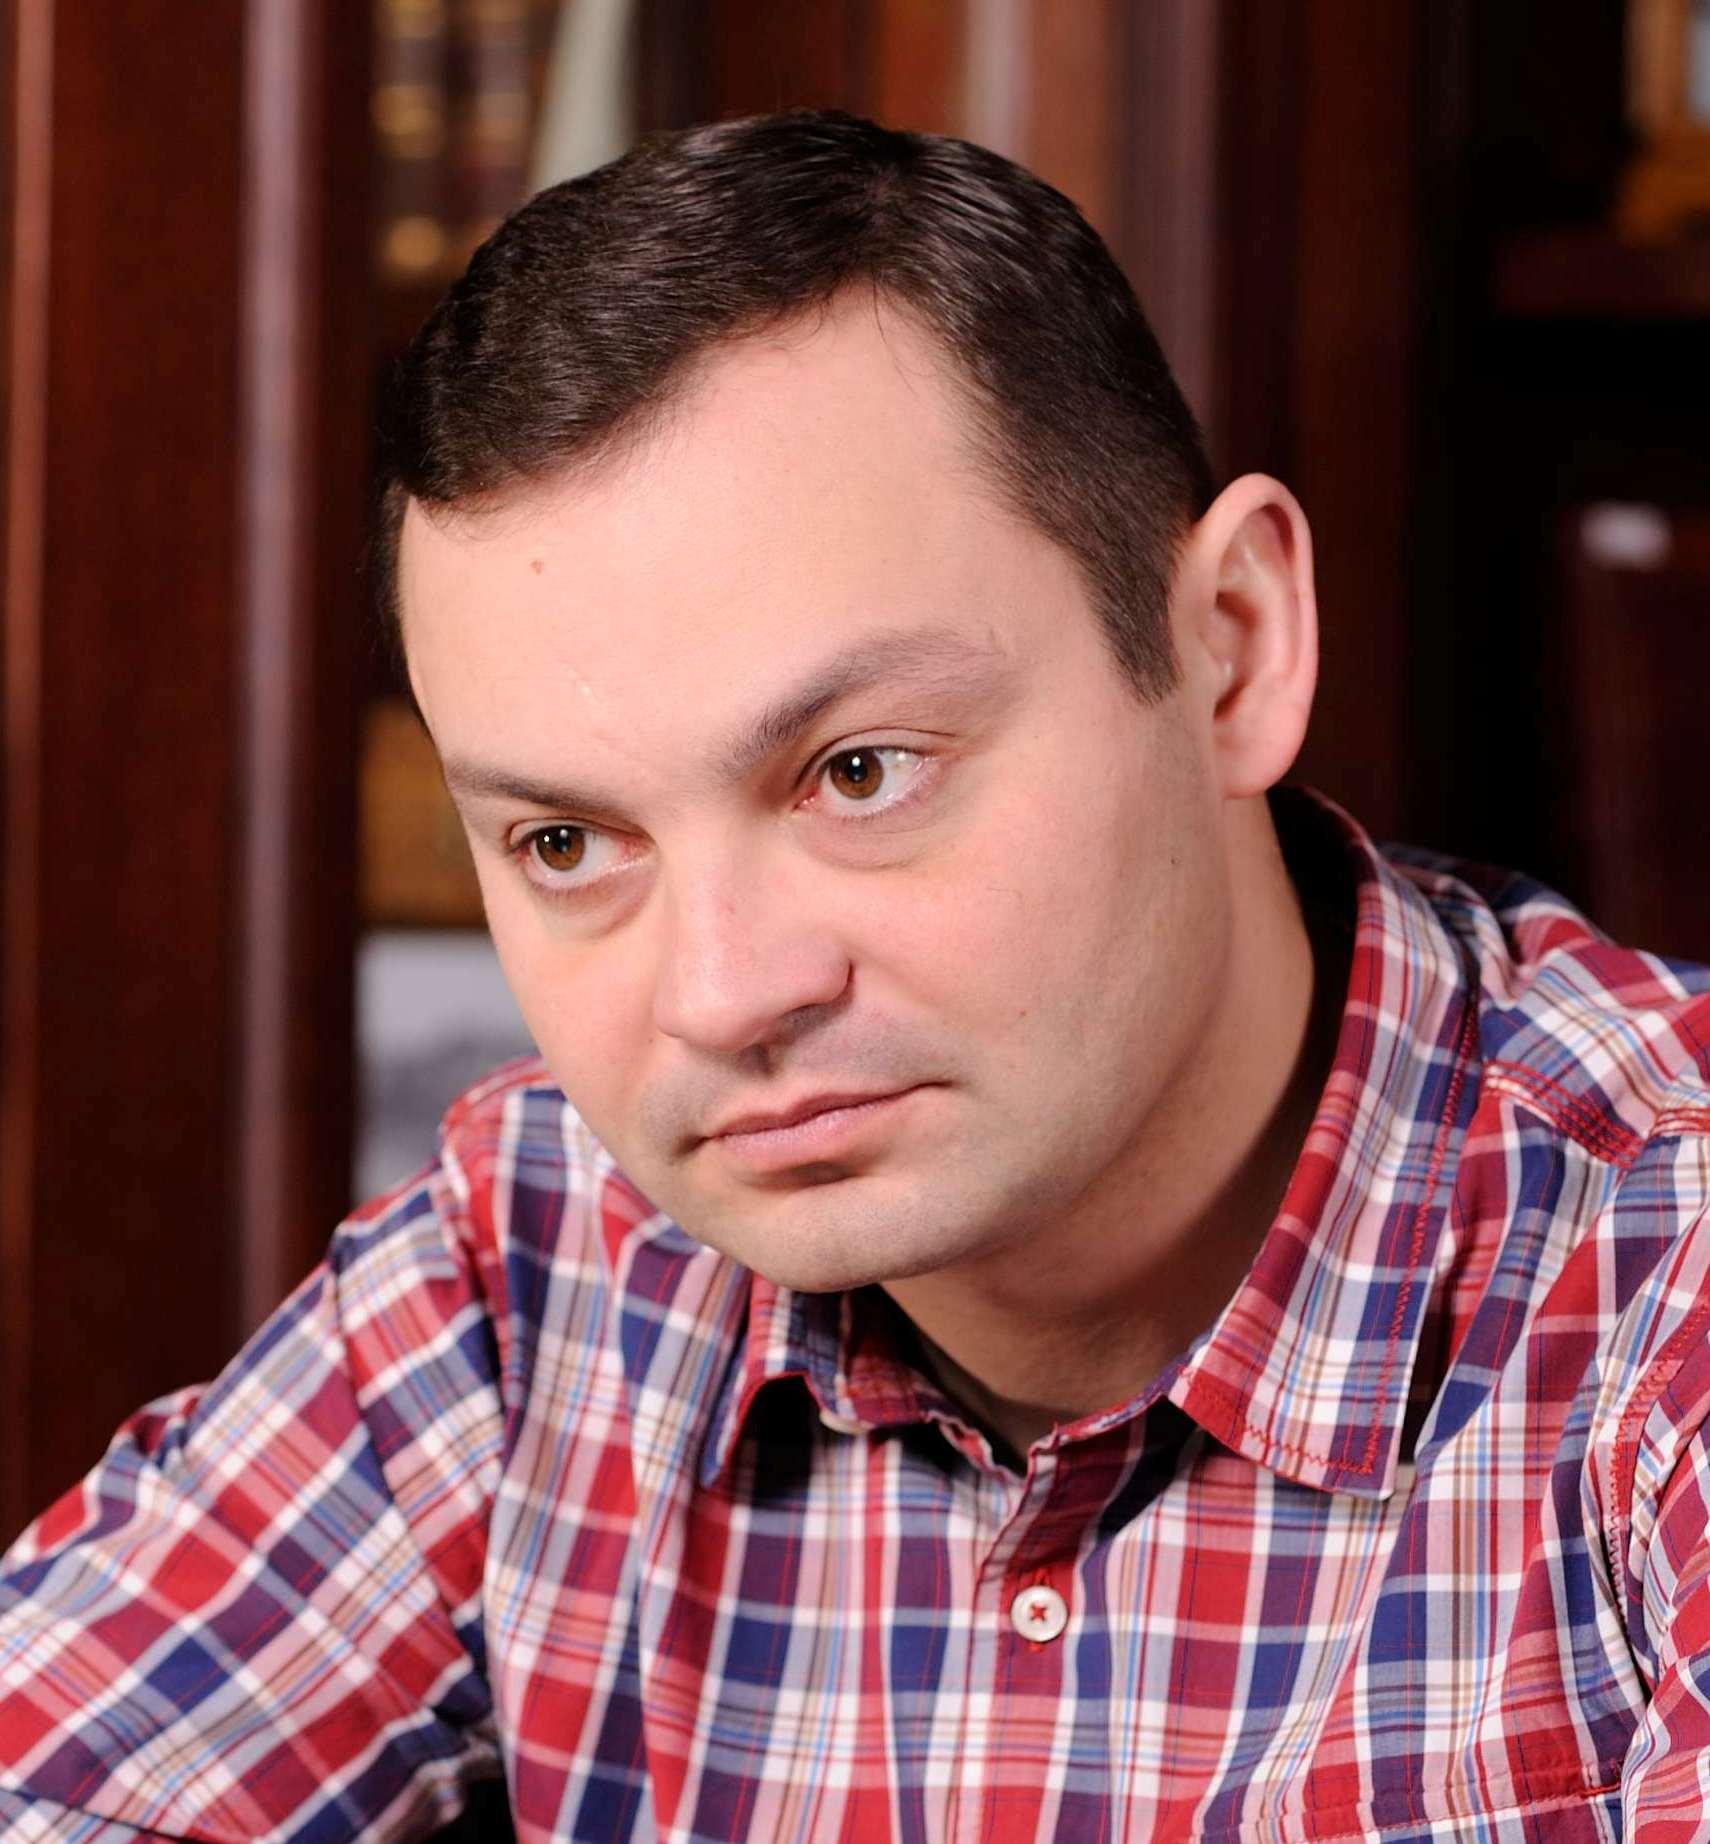 http://orthodoxmoscow.ru/wp-content/uploads/2015/07/orlov.jpg